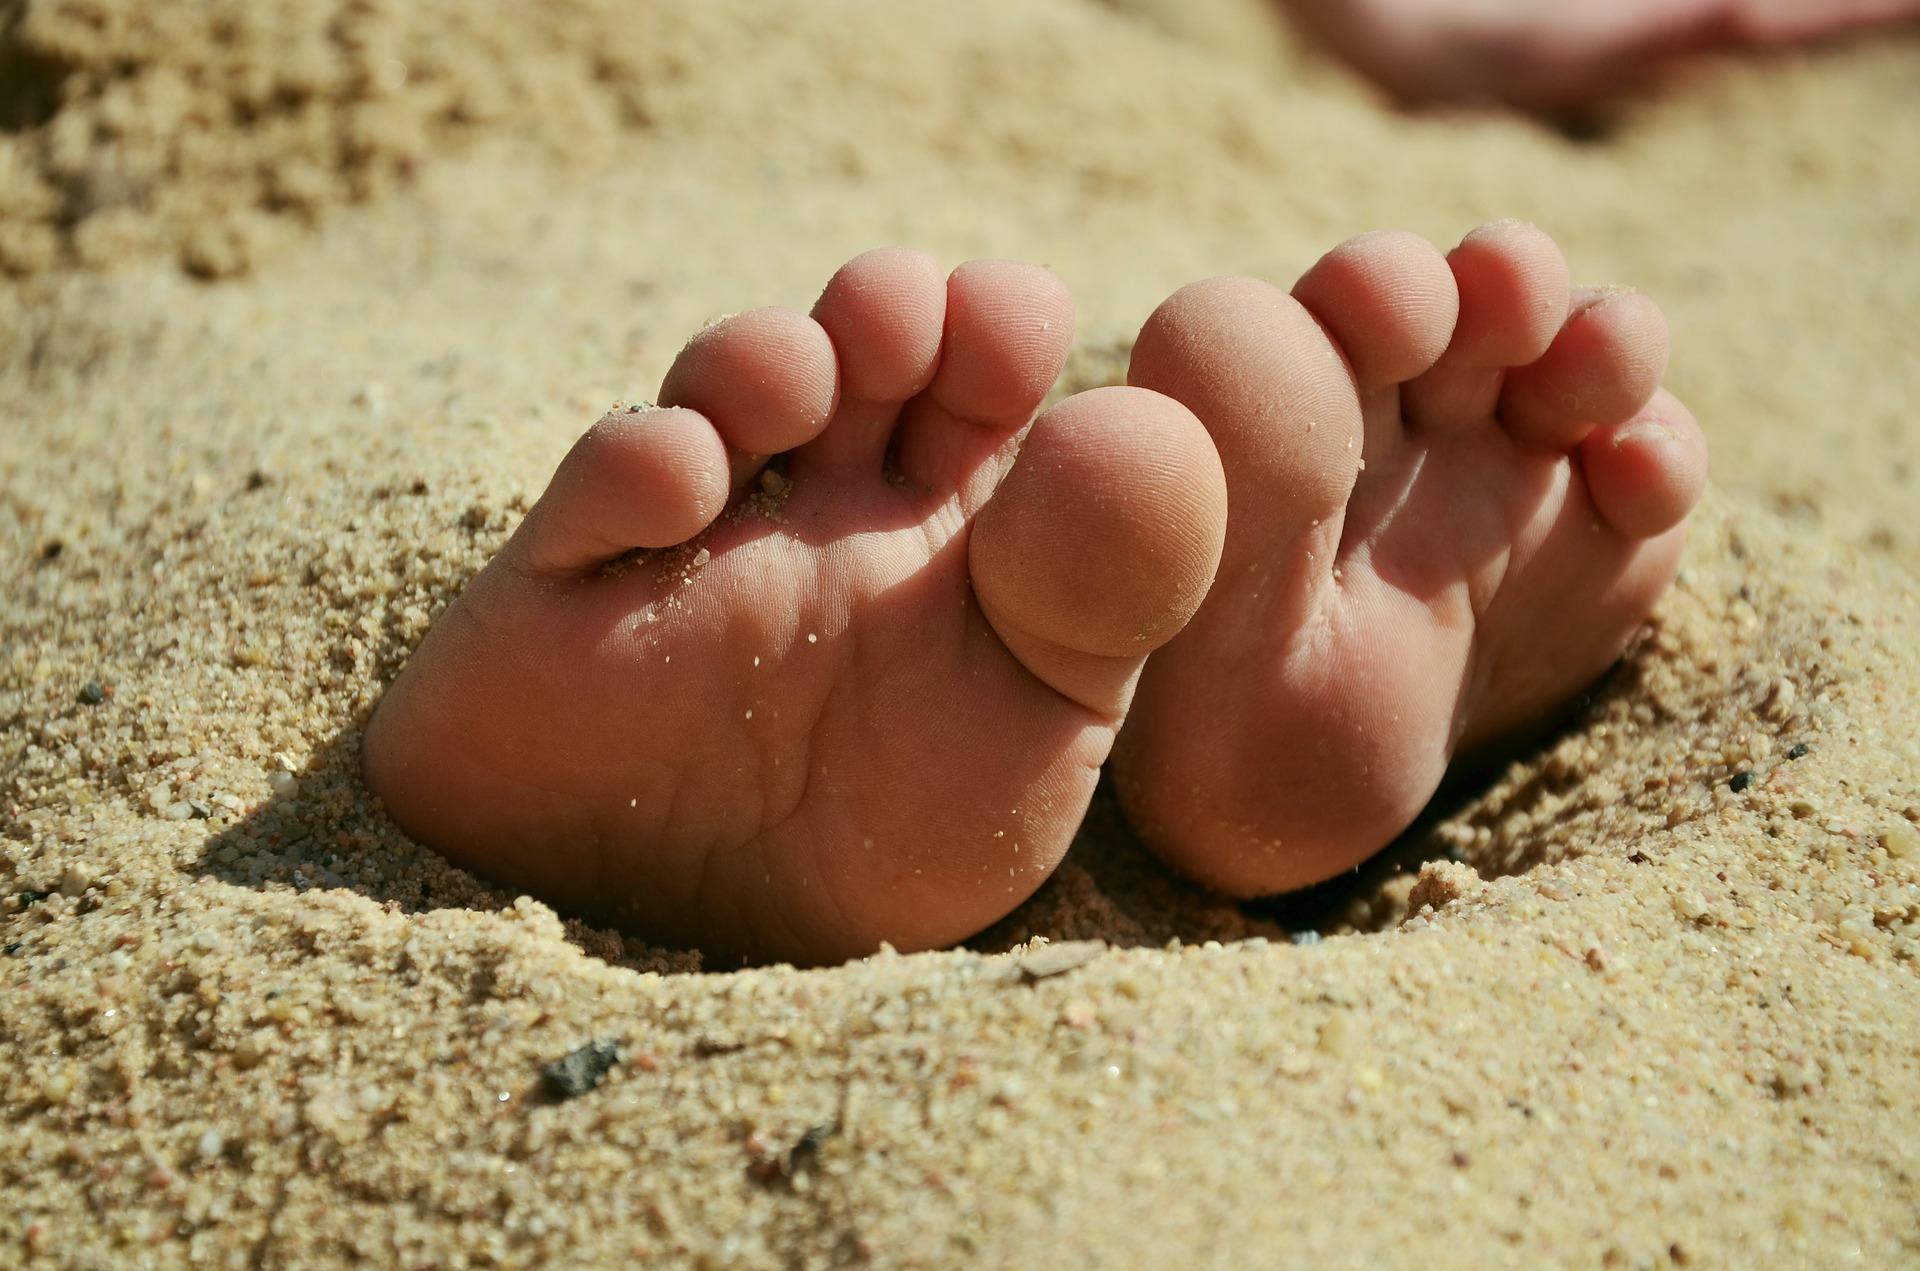 feet-717507_1920